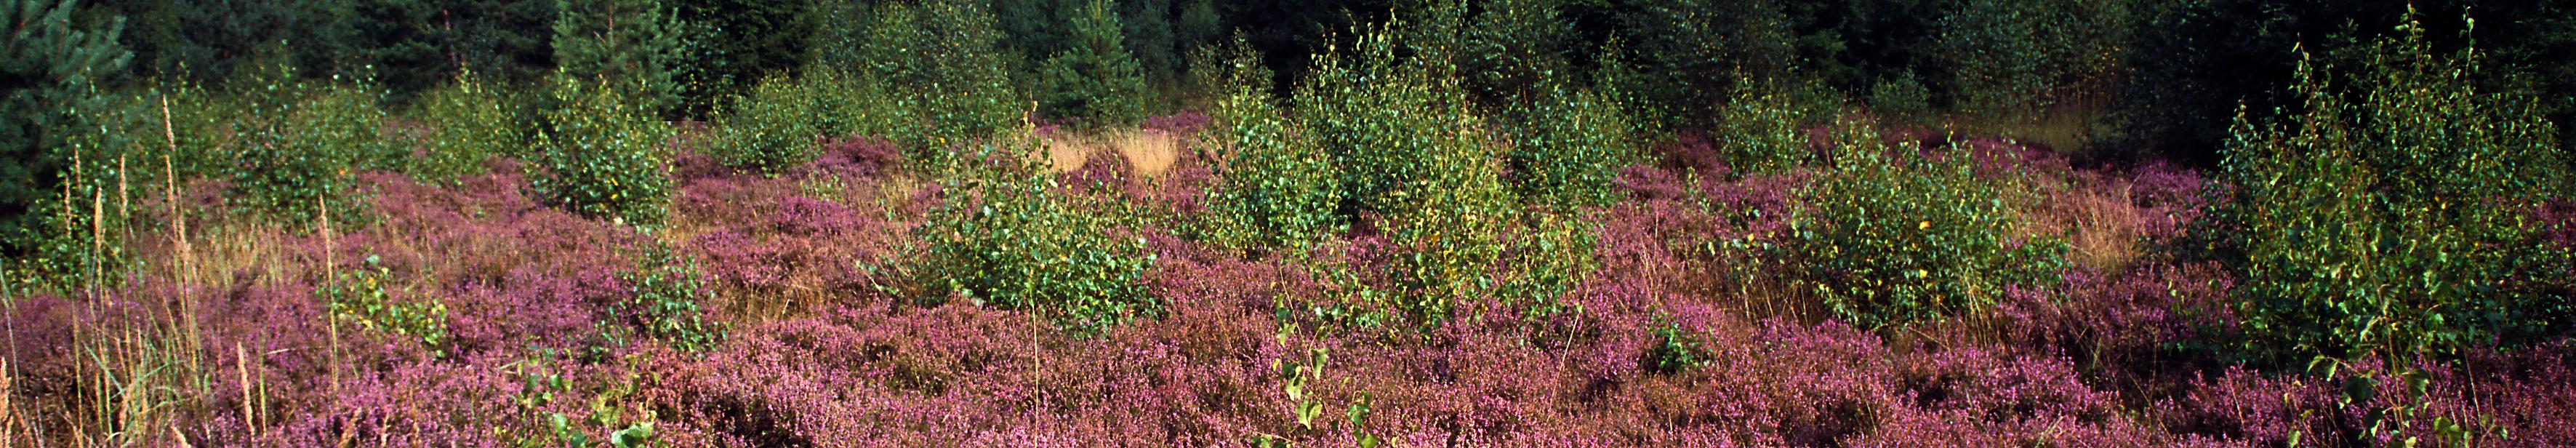 Heide im Pöllwitzer Wald © Frank Leo/fokus-natur.de